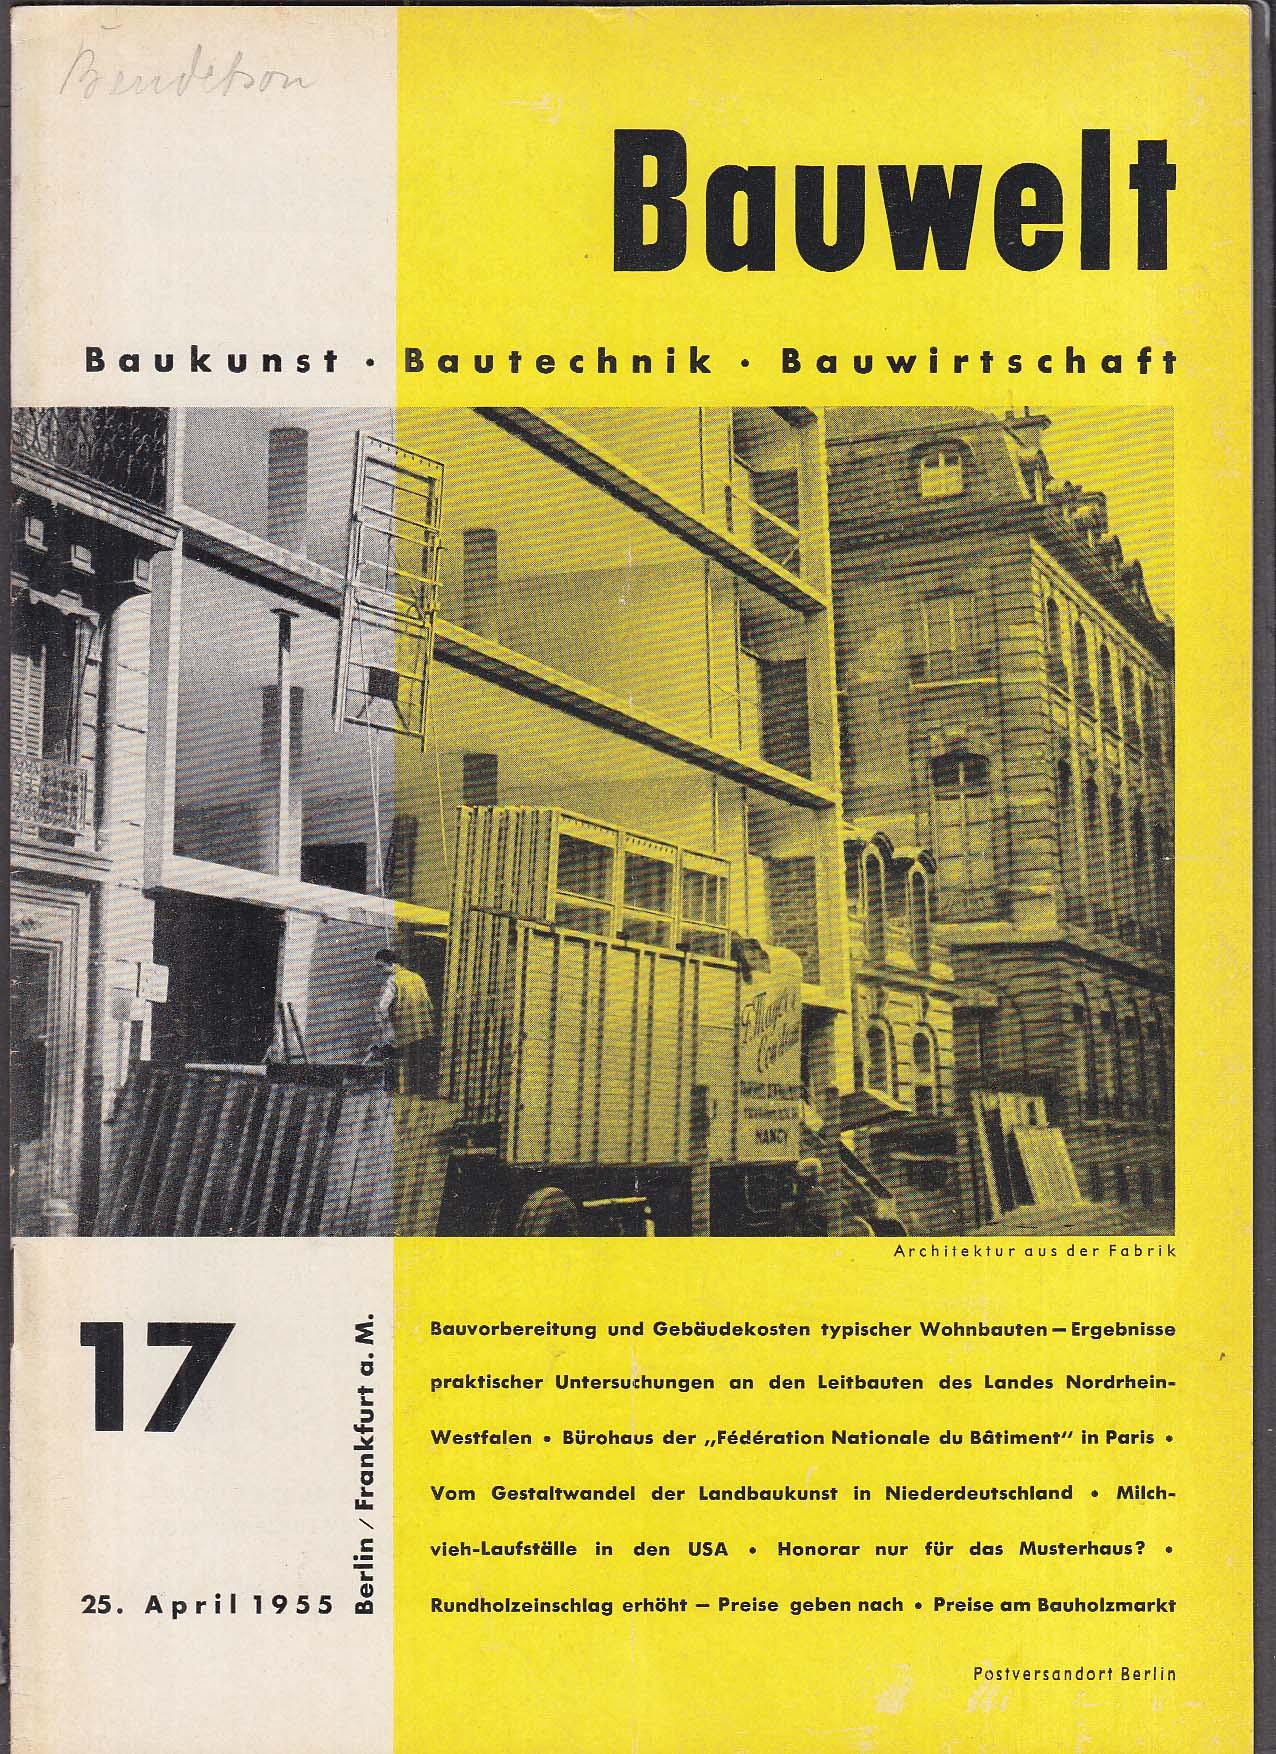 Bauwelt German architecture magazine 5/25/1955 17